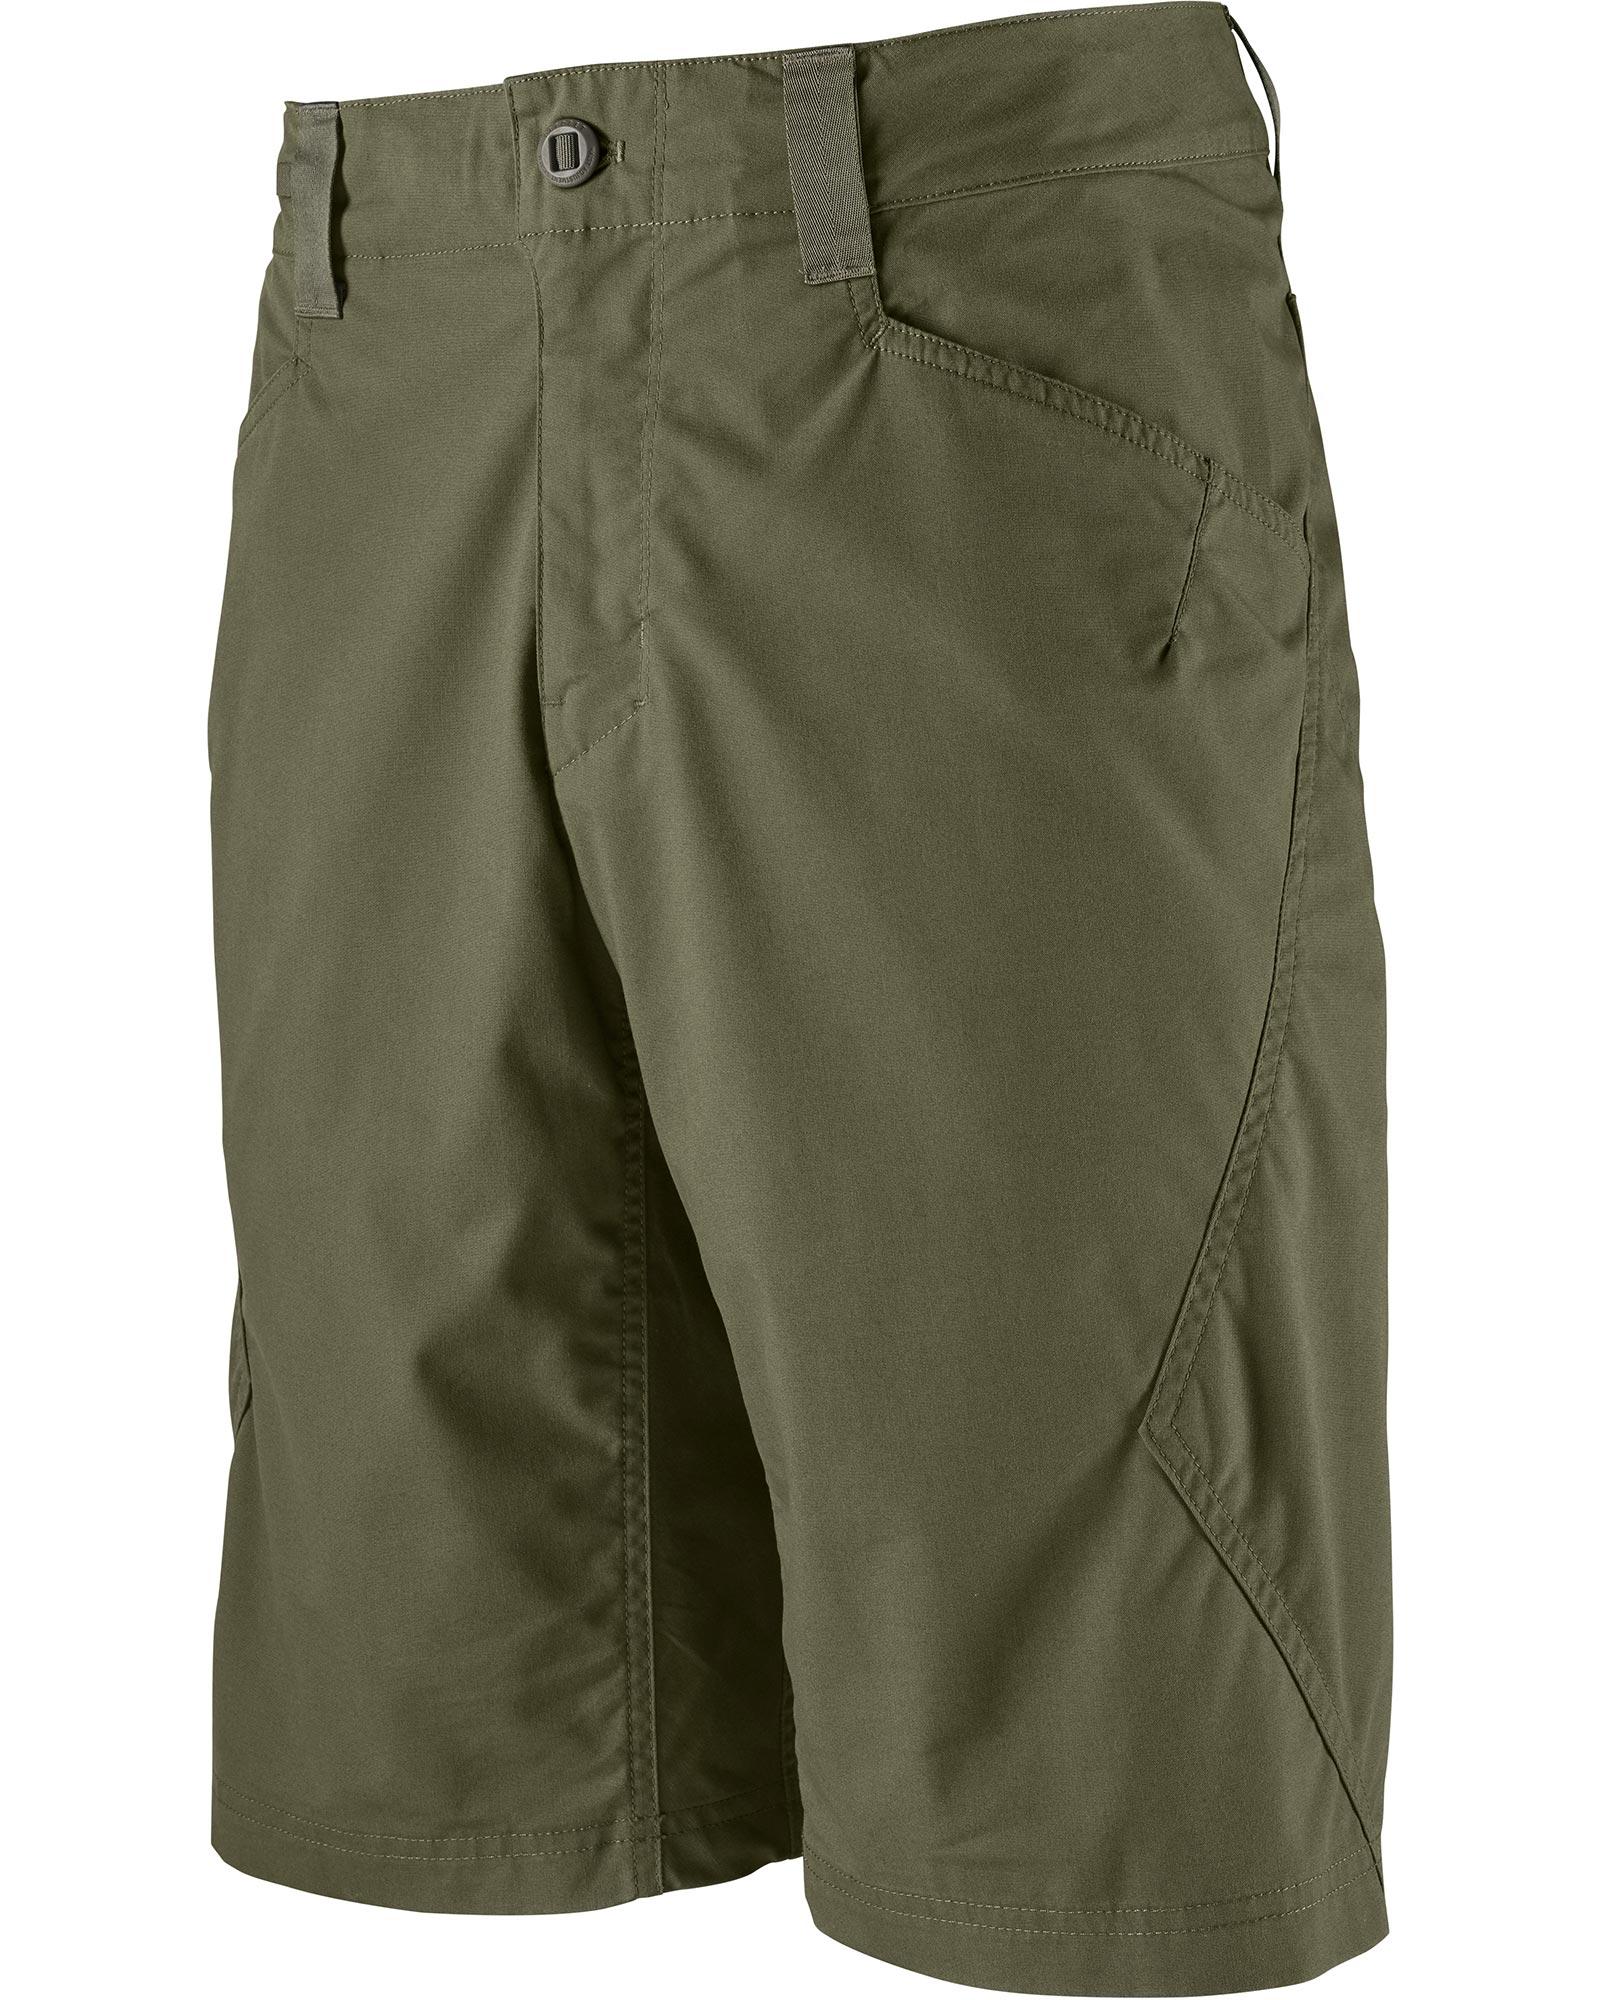 Product image of Patagonia Men's Venga Rock Shorts